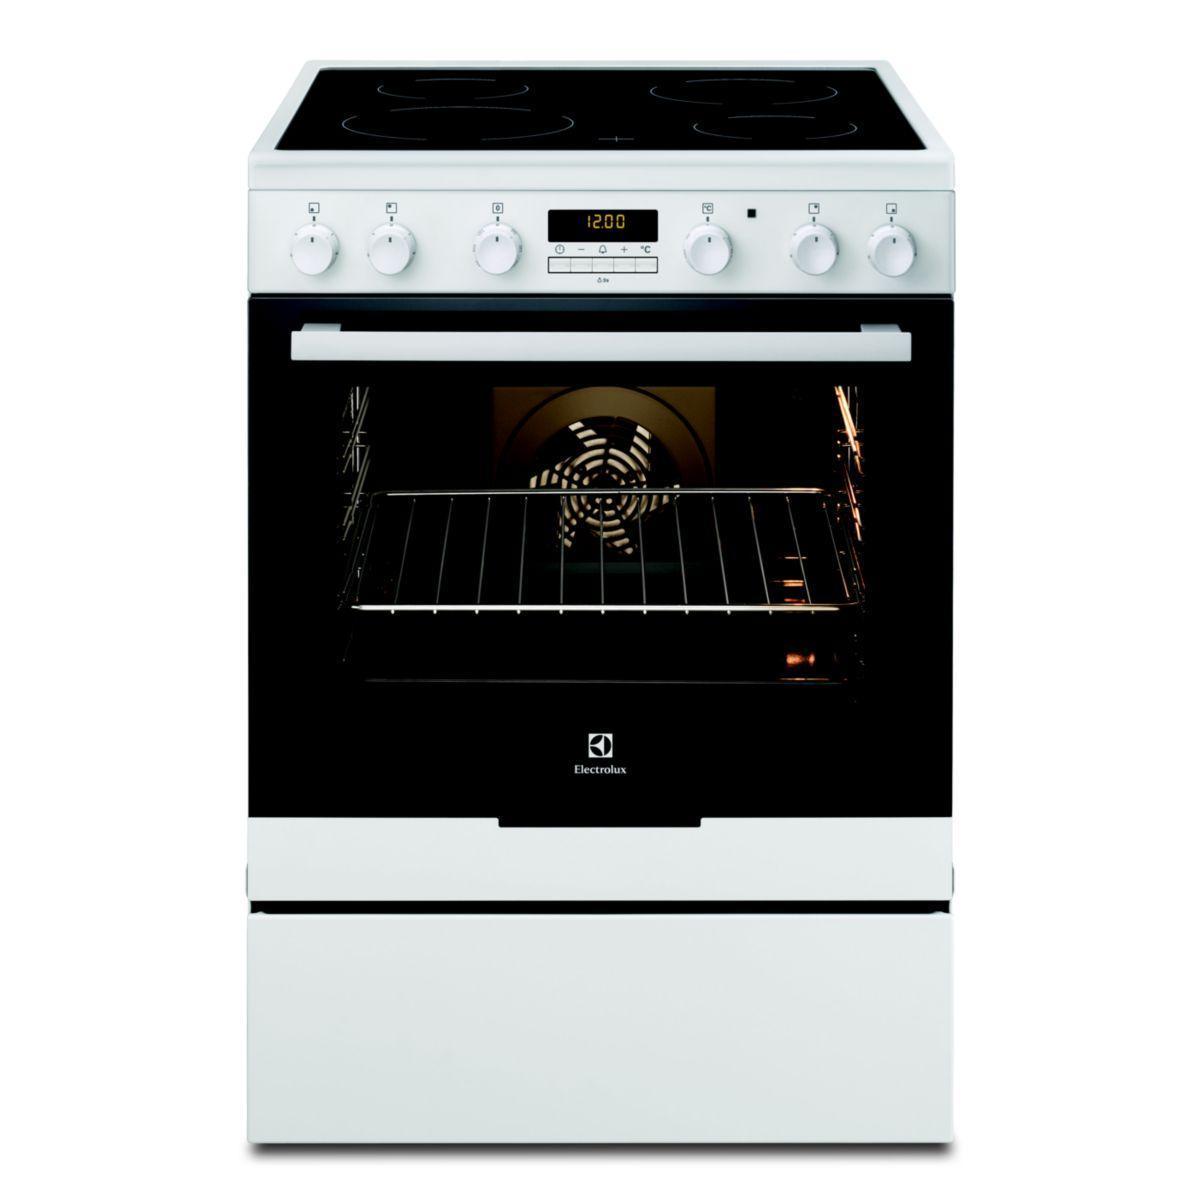 Pack promo cuisinière vitrocéramique pyrolyse electrolux ekc 6670 aow + groupe aspirant electrolux efg 50300 x (photo)